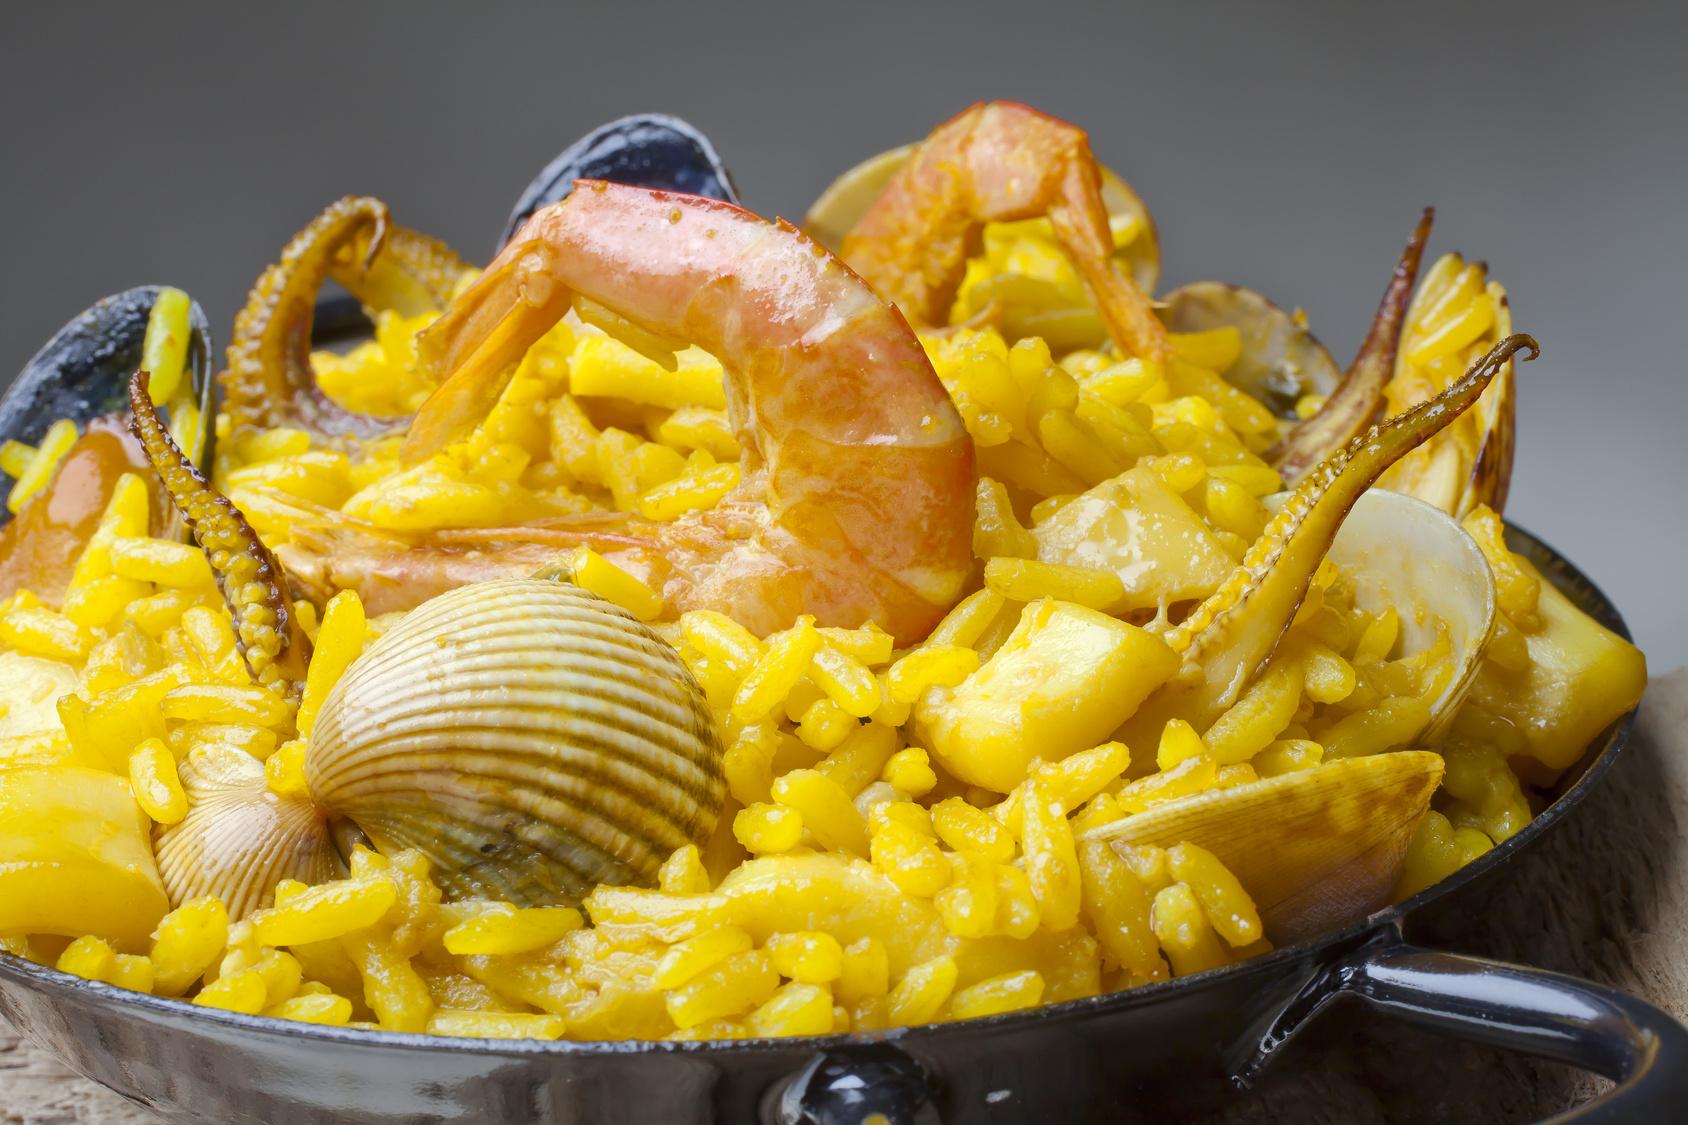 Clases de cocina tem ticas culinary spainculinary spain - Clases cocina malaga ...